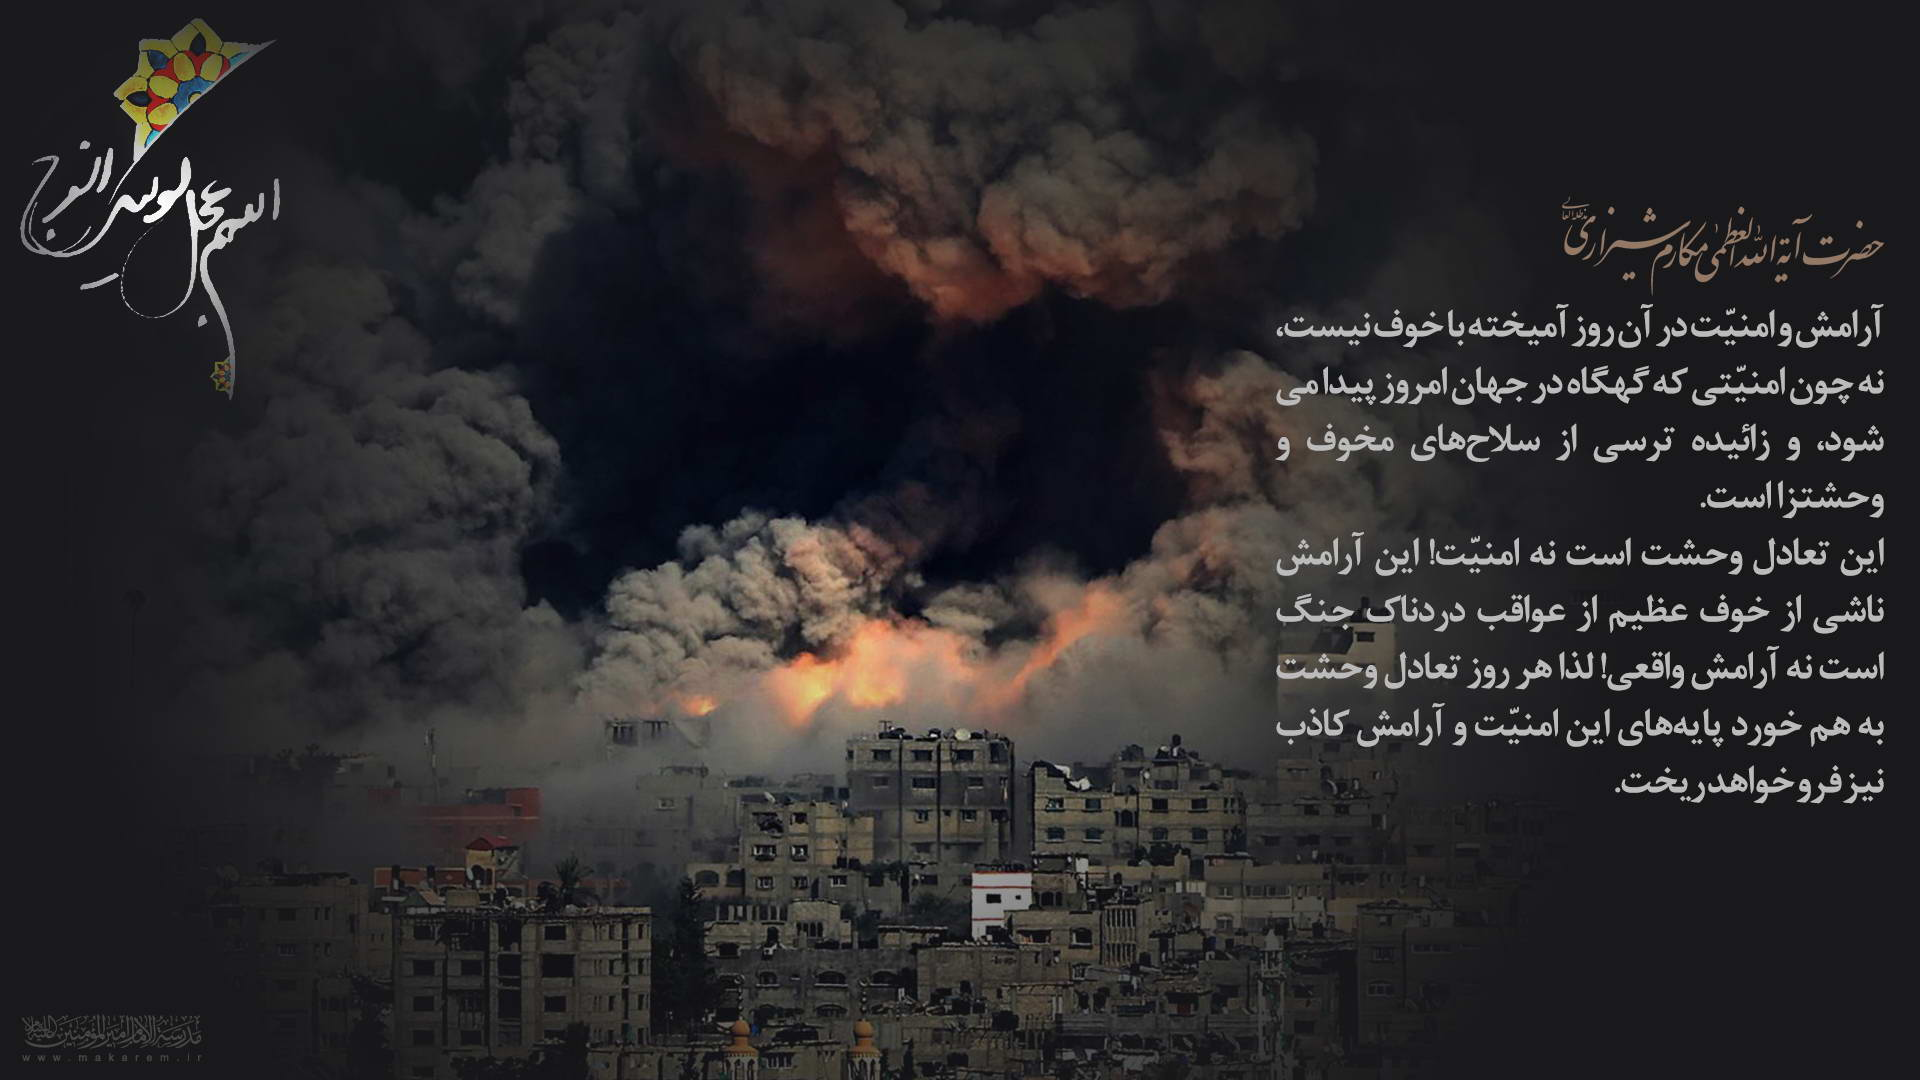 امام زمان 02-مدرسه الامام امیر المومنین (ع)